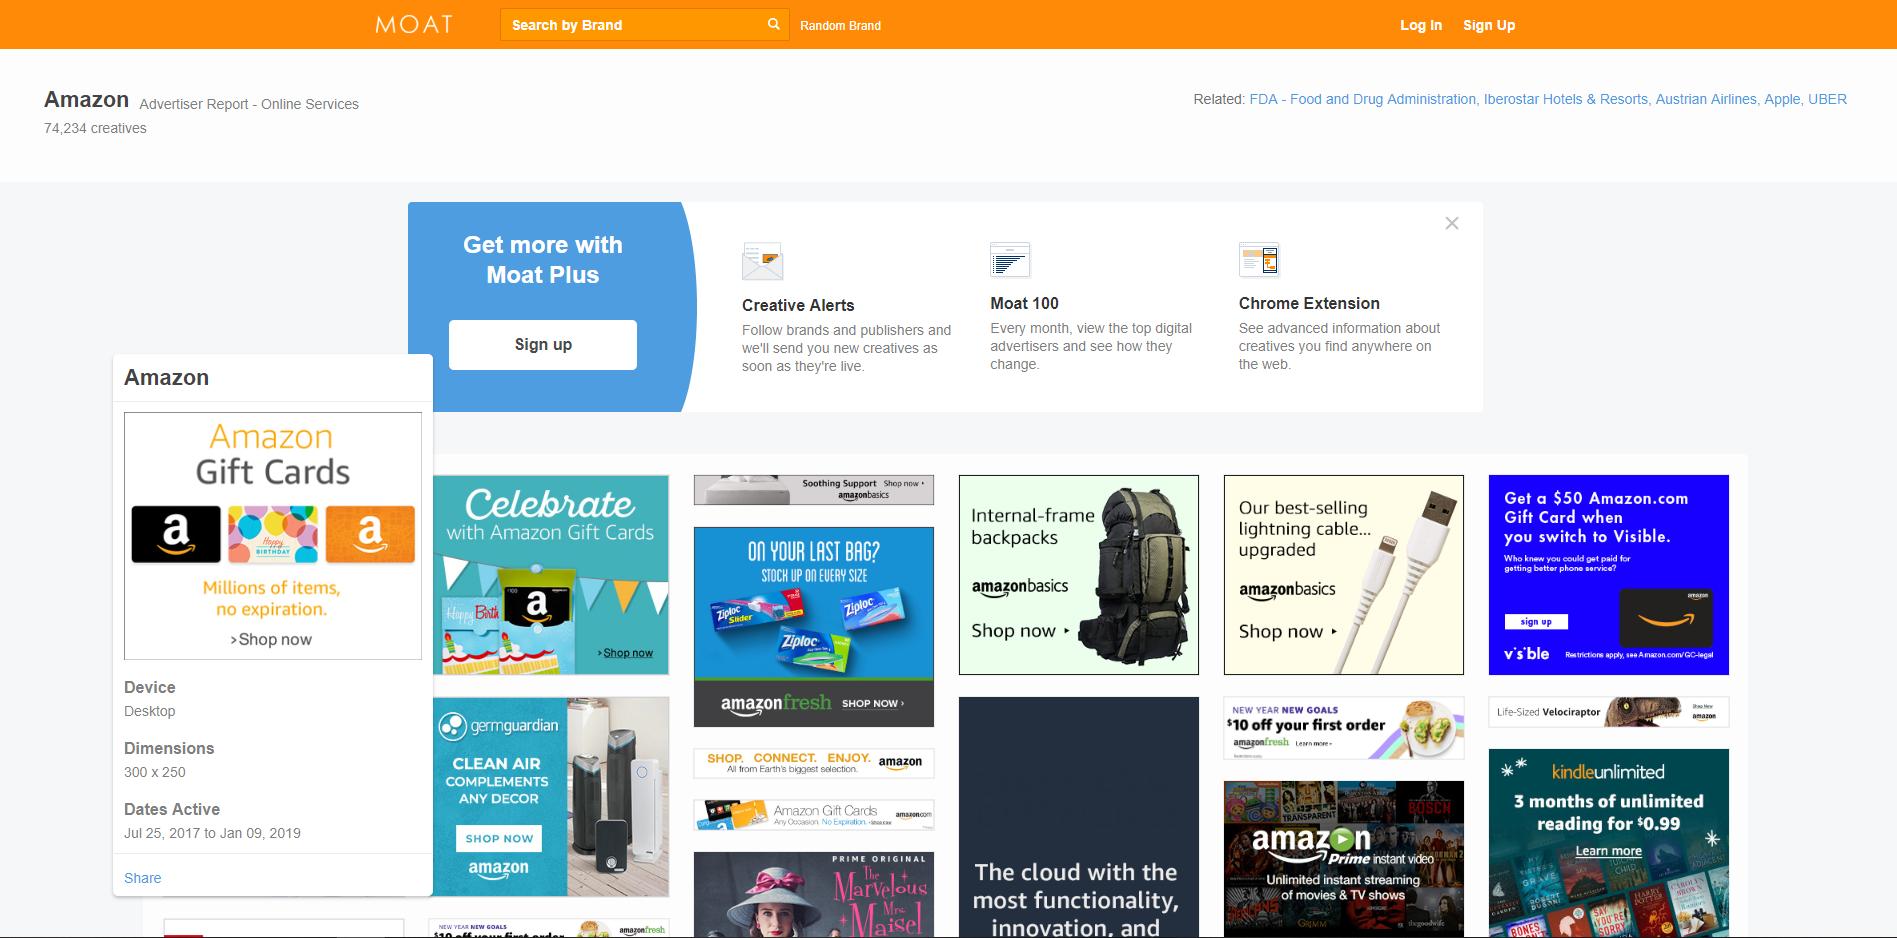 MOAT - Amazon Display Ads